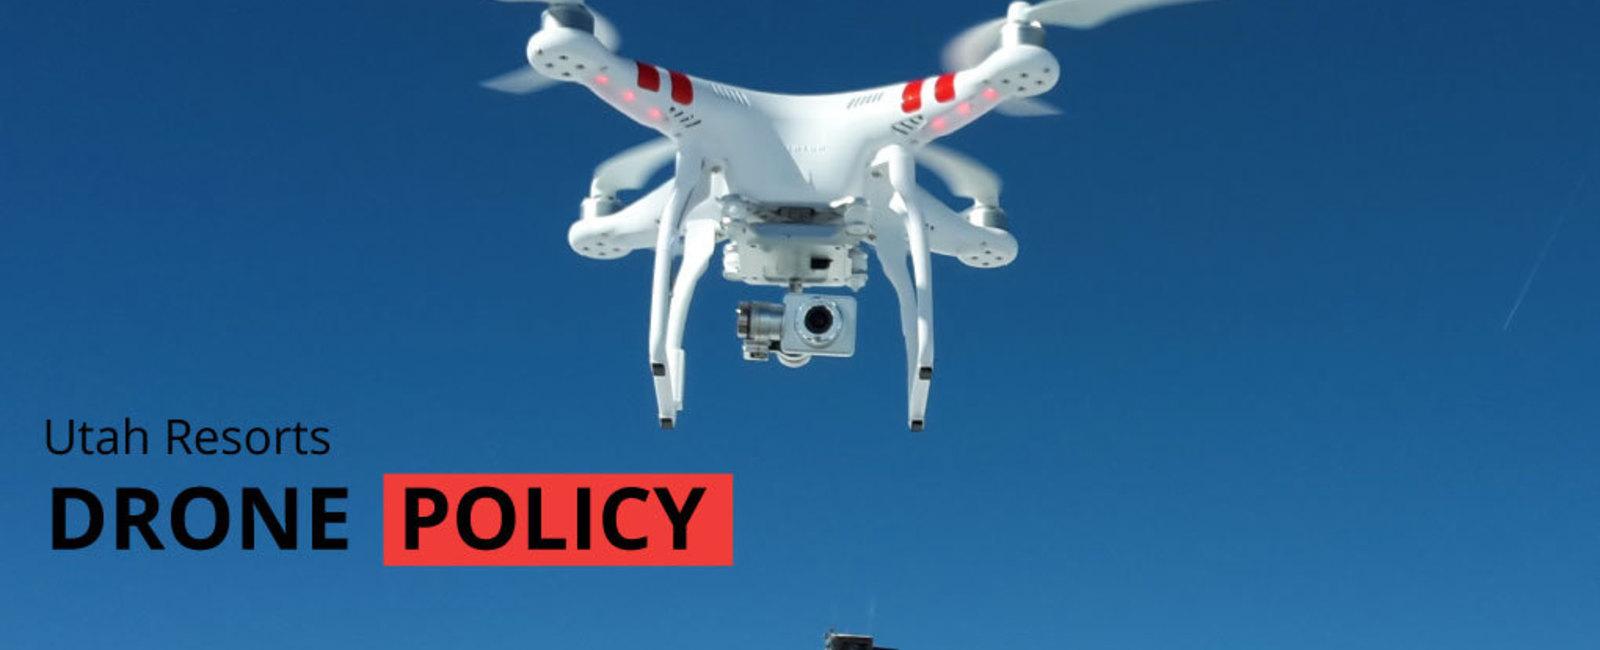 Utah Resort Drone Policies